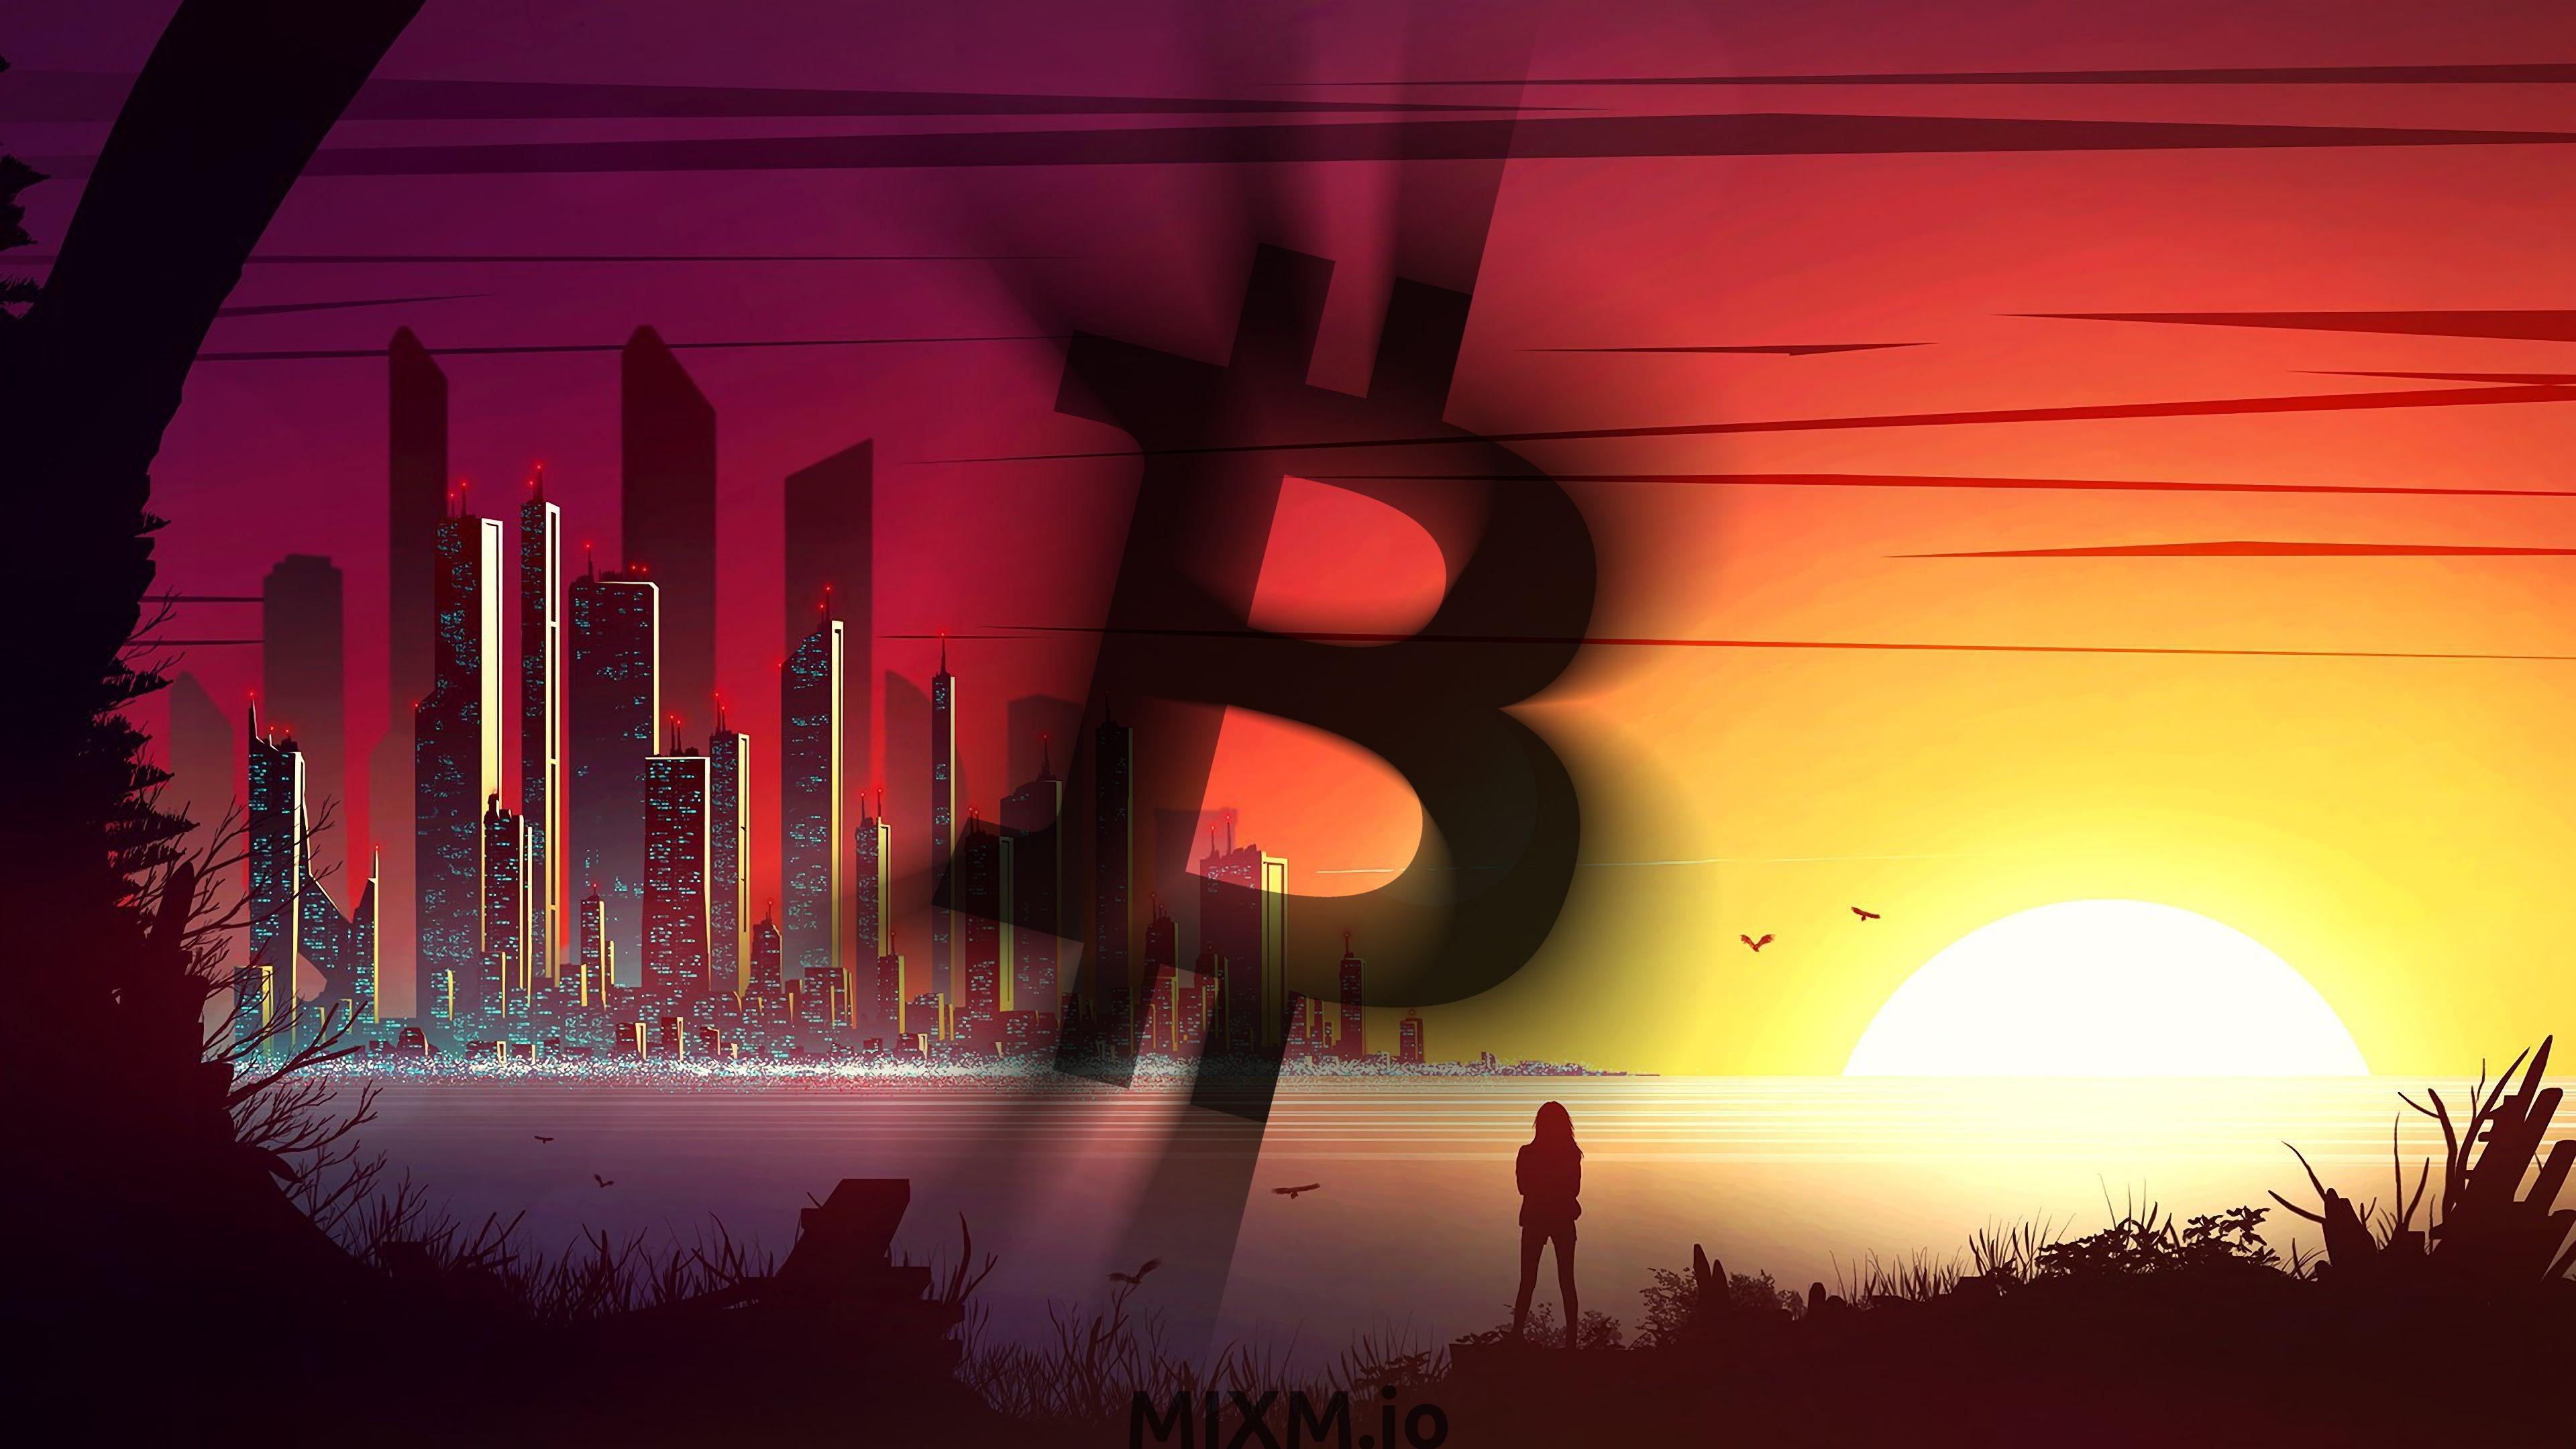 Wallpaper Background Bitcoin Free Wallpaper Bitcoins Free